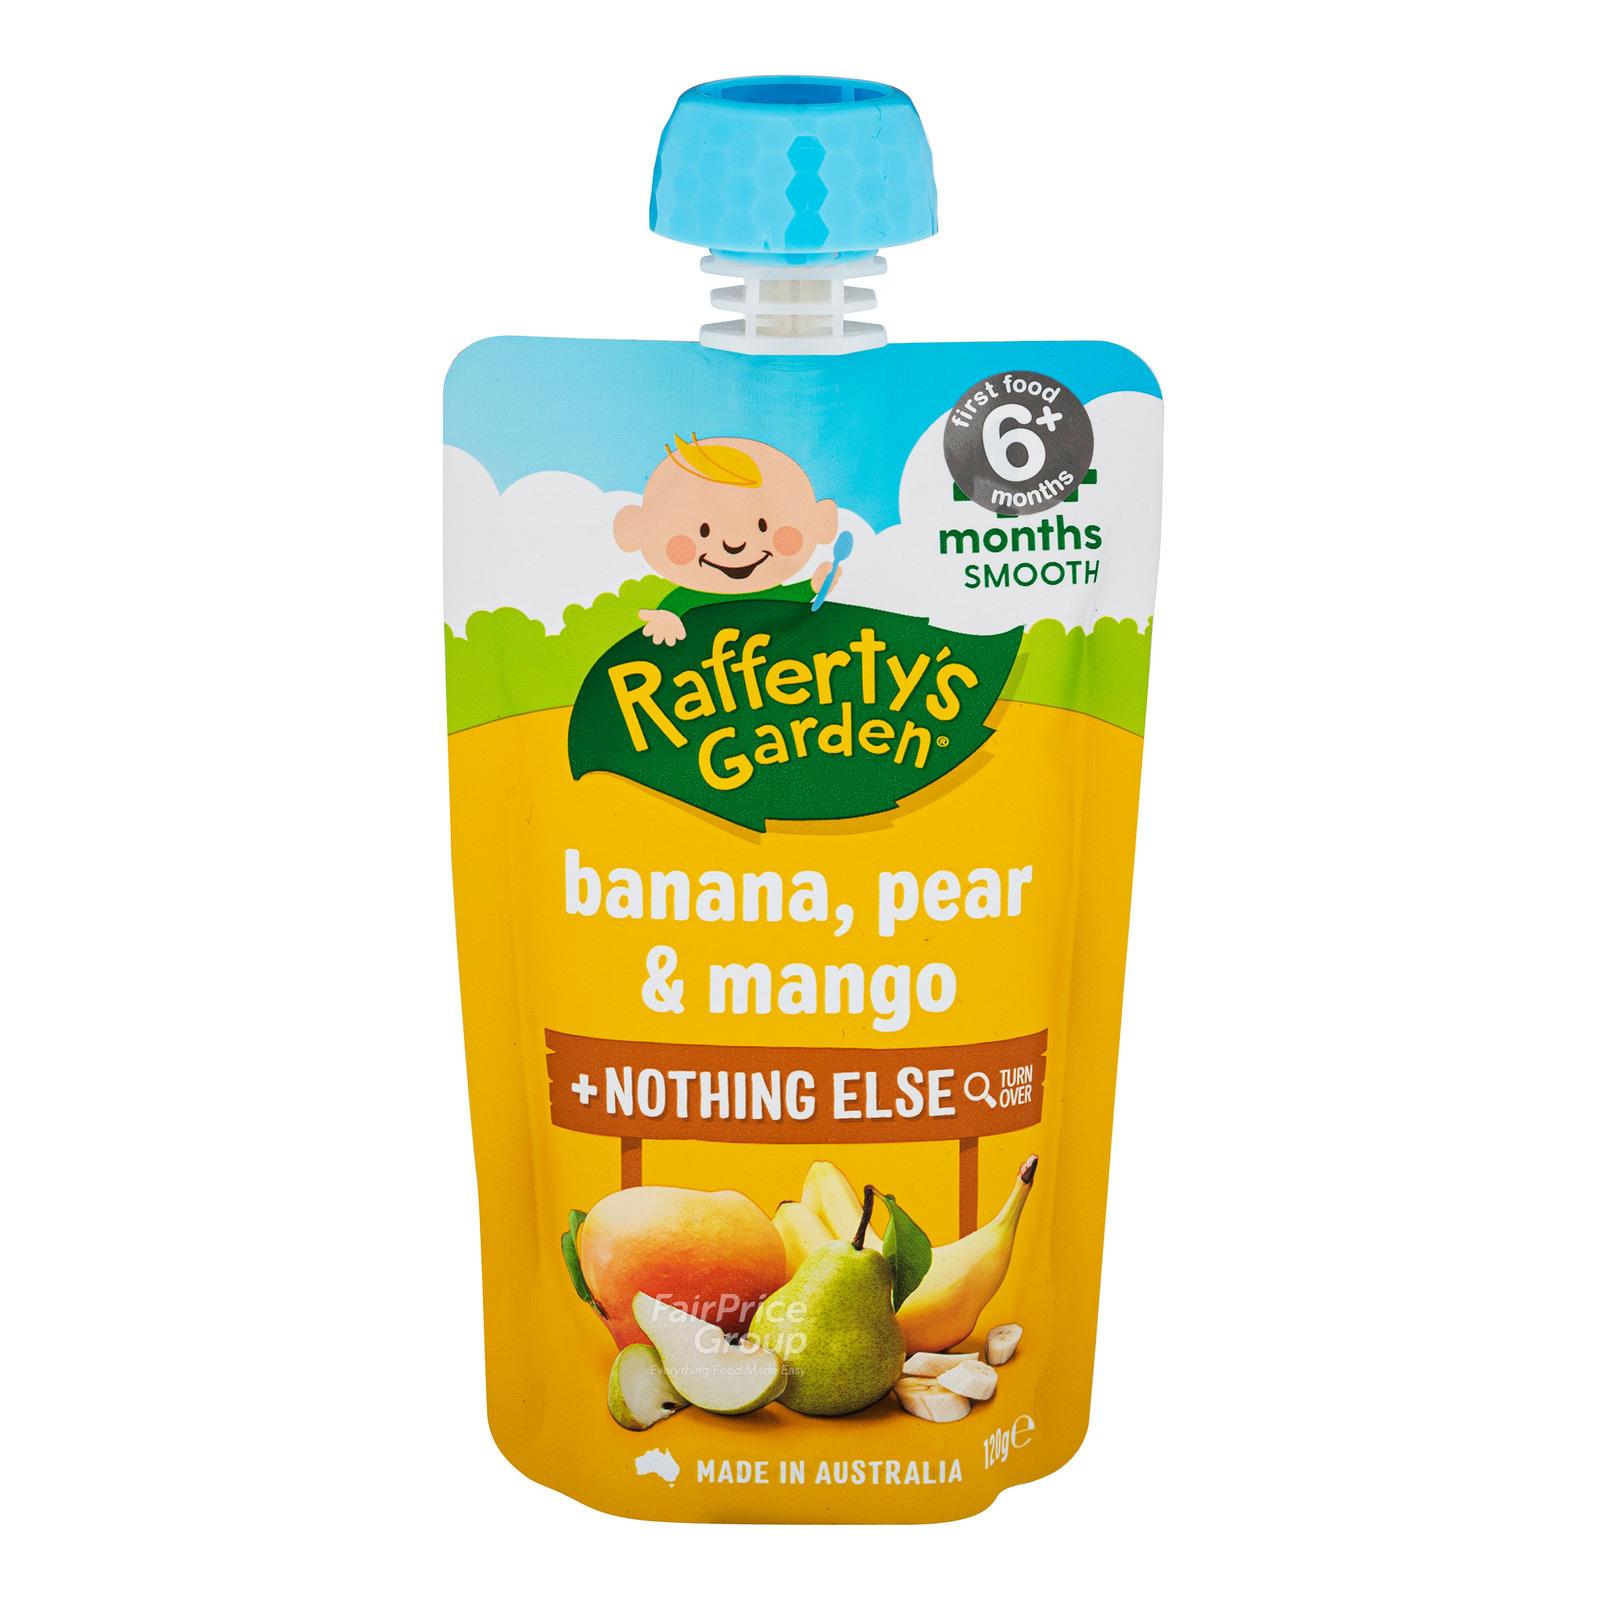 Rafferty's Garden Baby Food - Banana, Pear & Mango